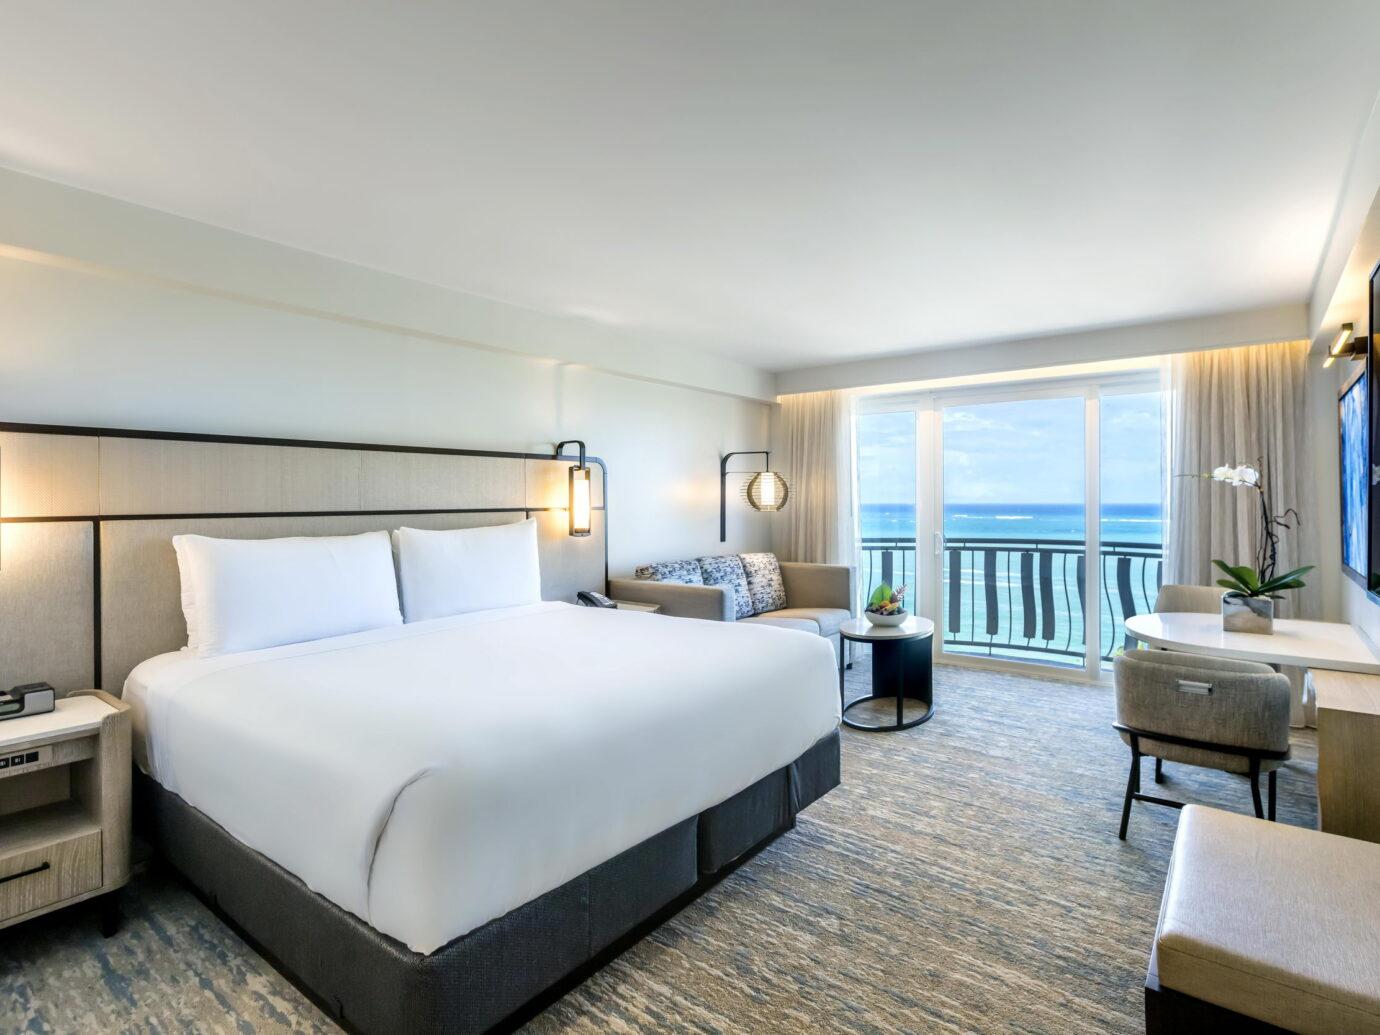 Bedroom at Intercontinental San Juan